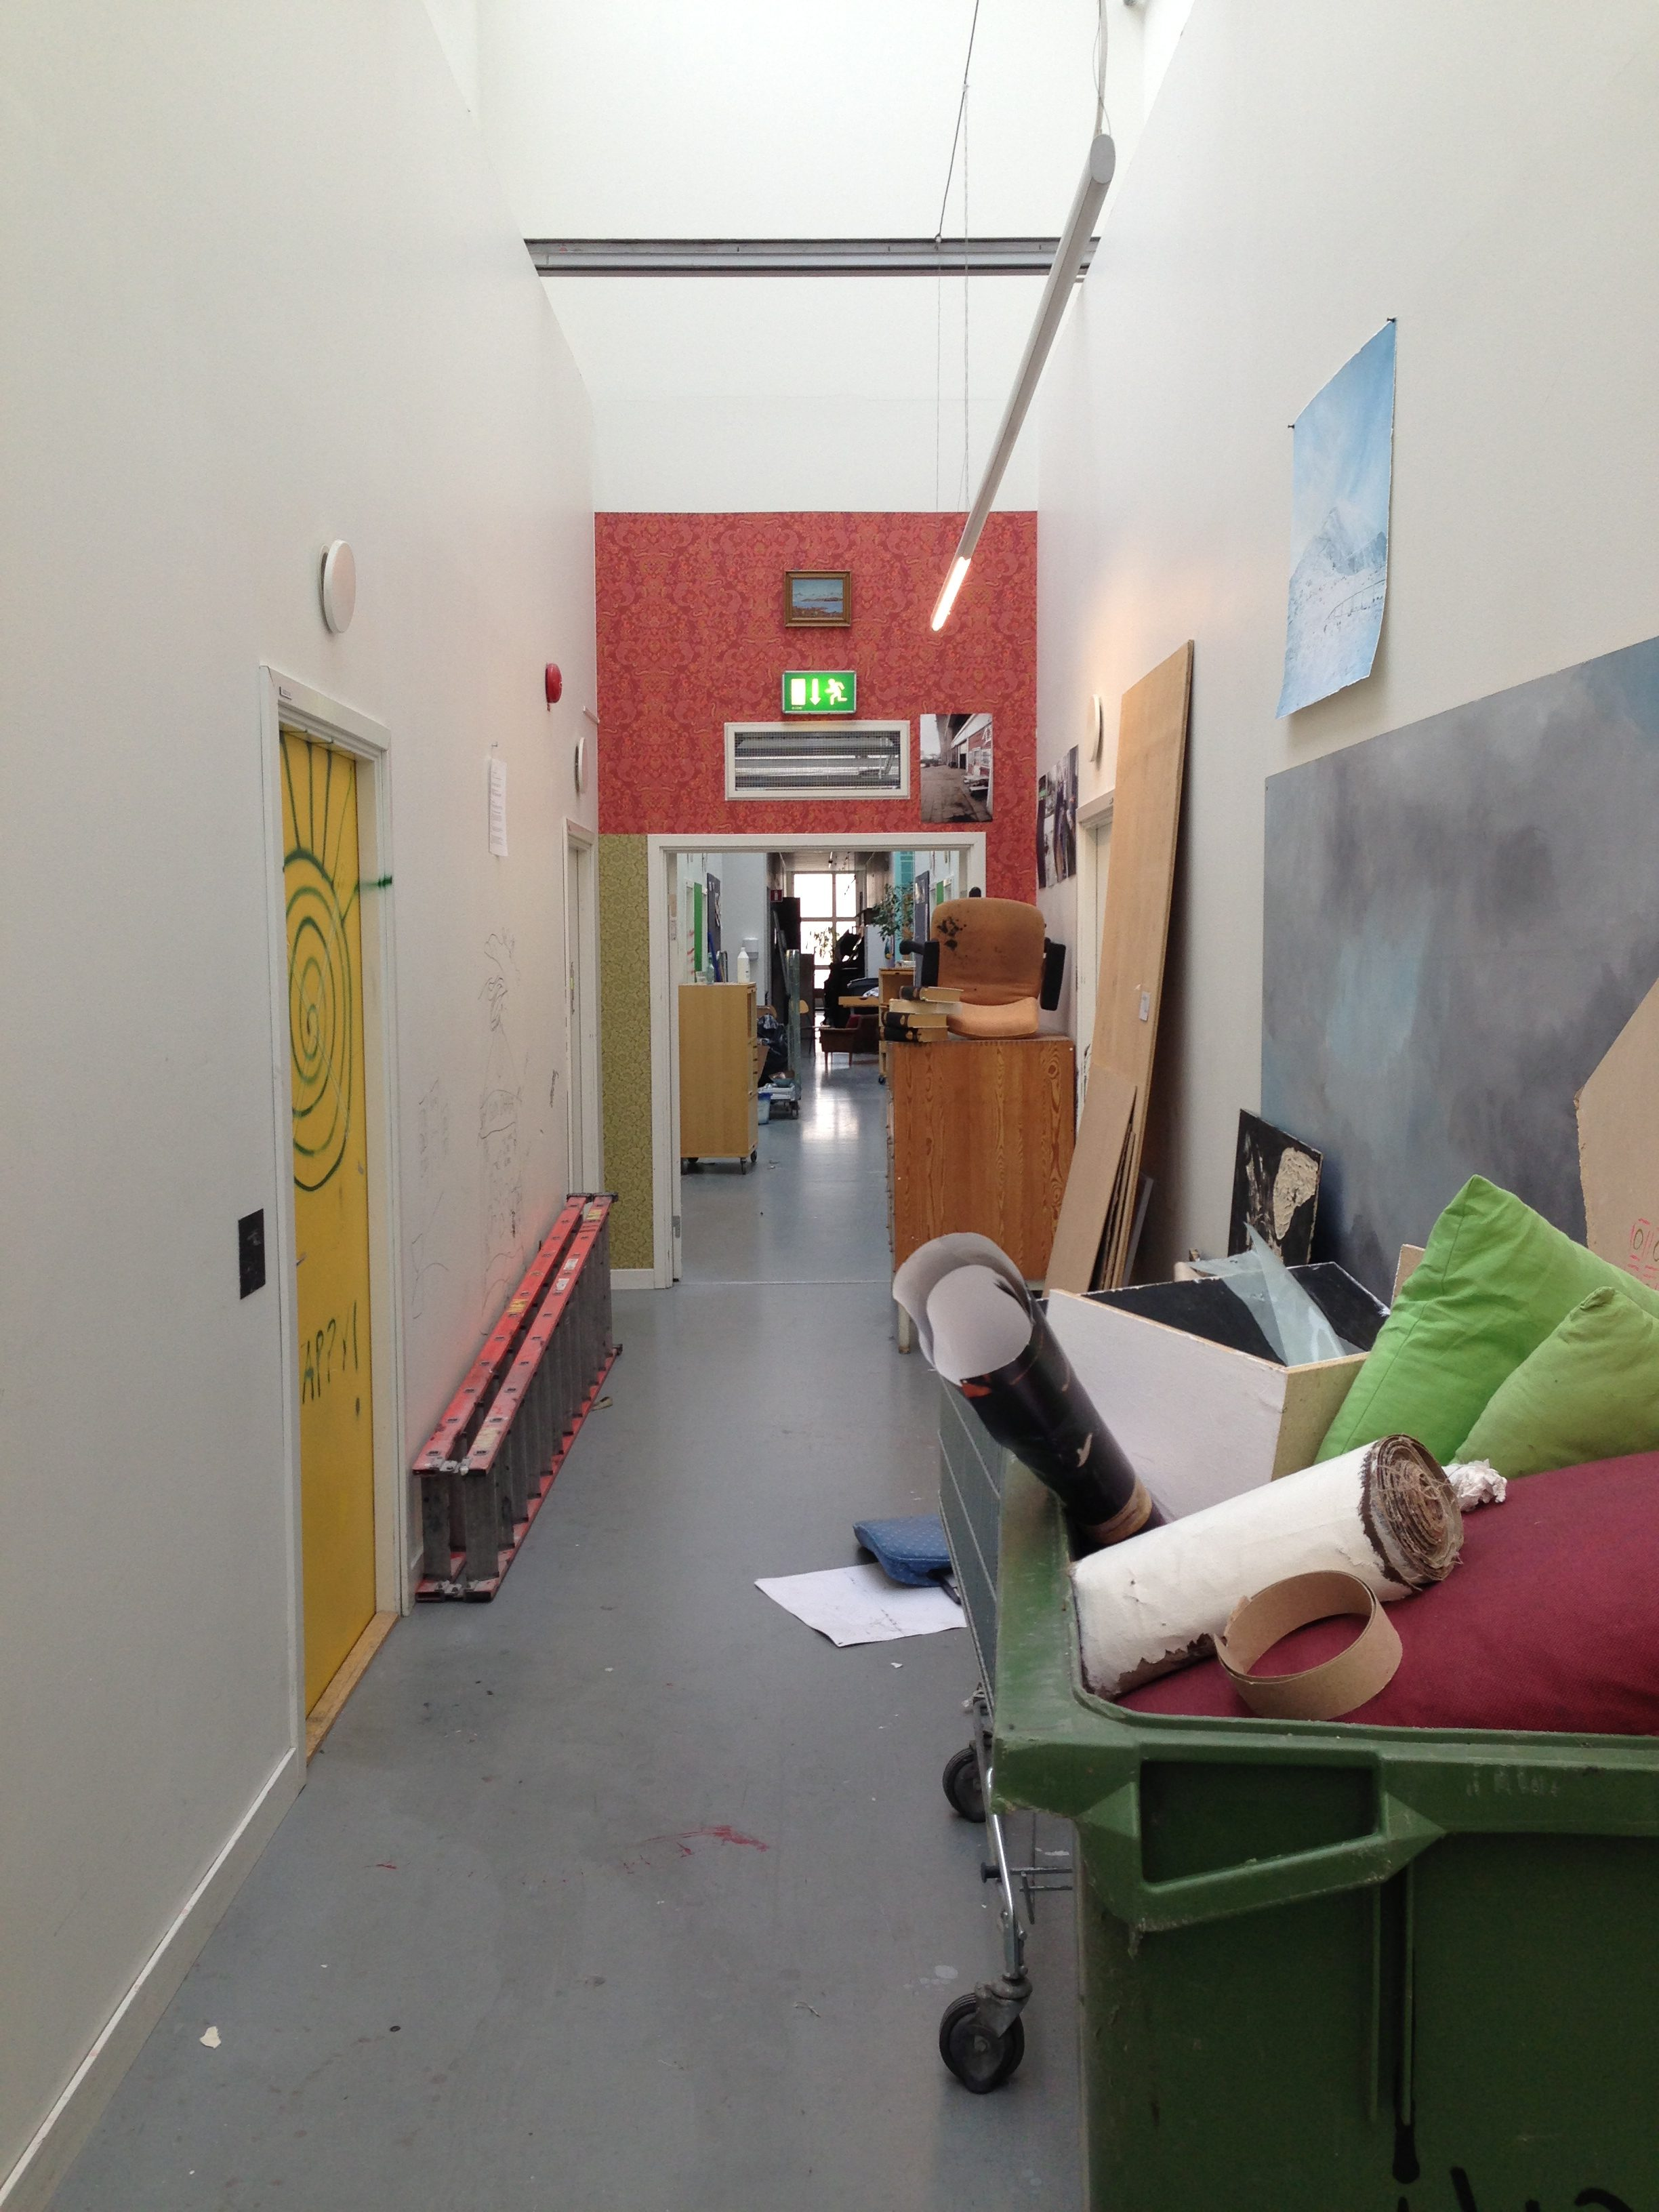 Konstfack Skolan, 2013. Foto Maxronnersjo, kunstacademie, interieur